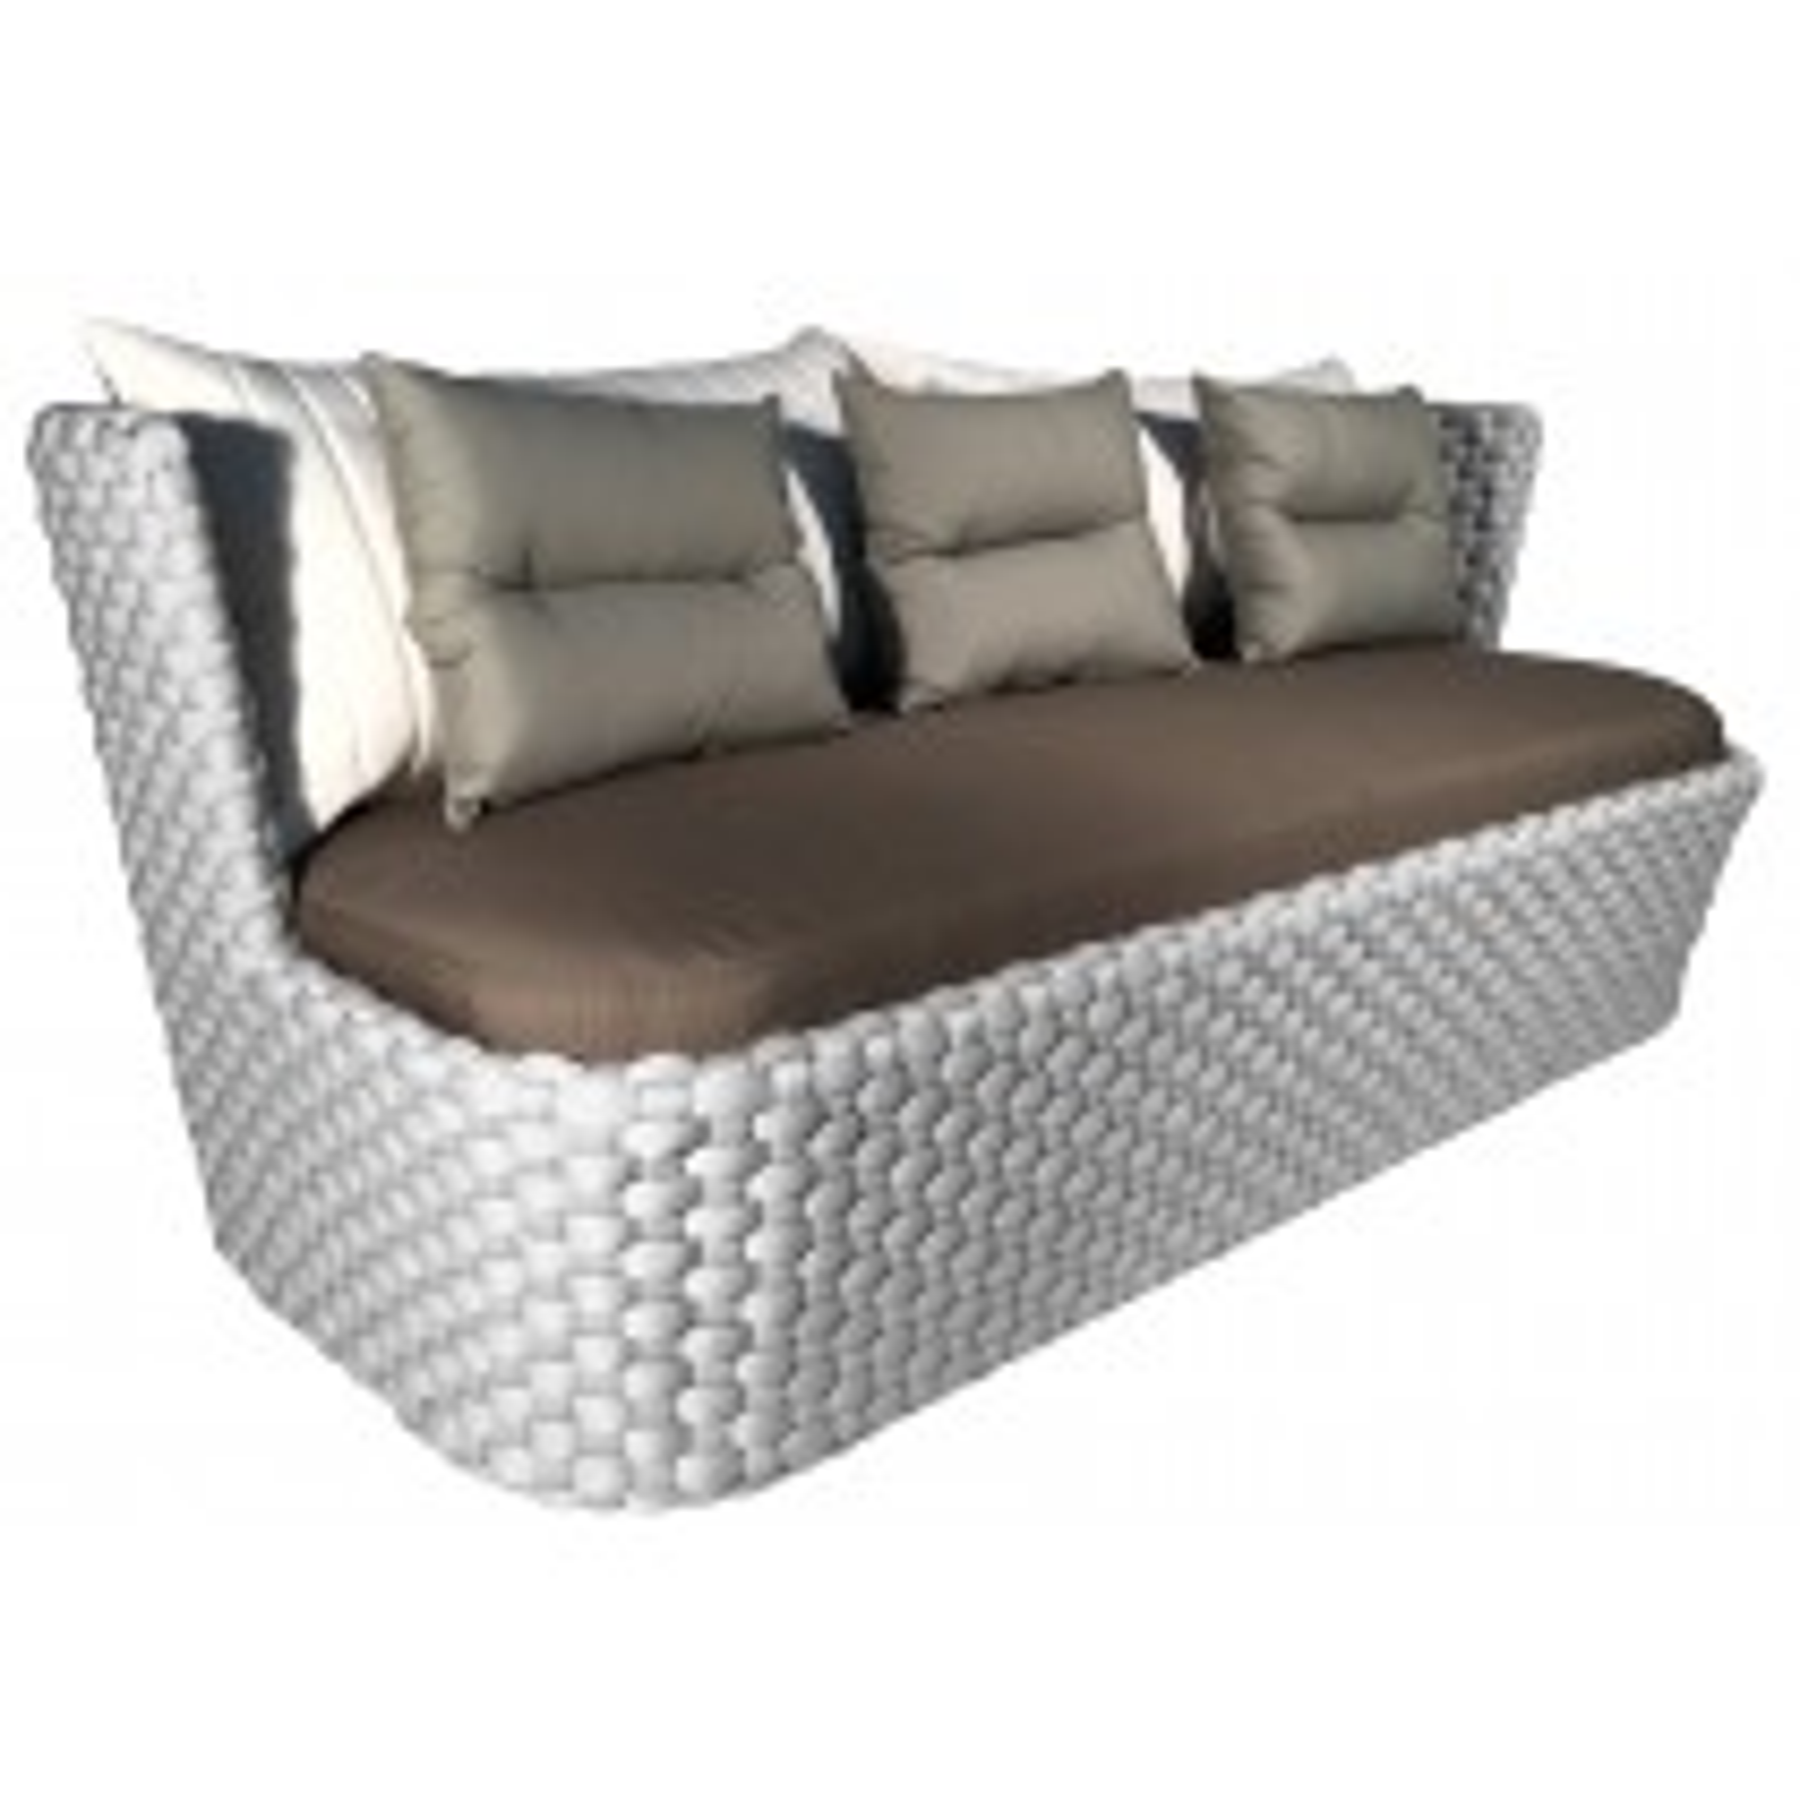 Capadocia 2-Seater Sofa